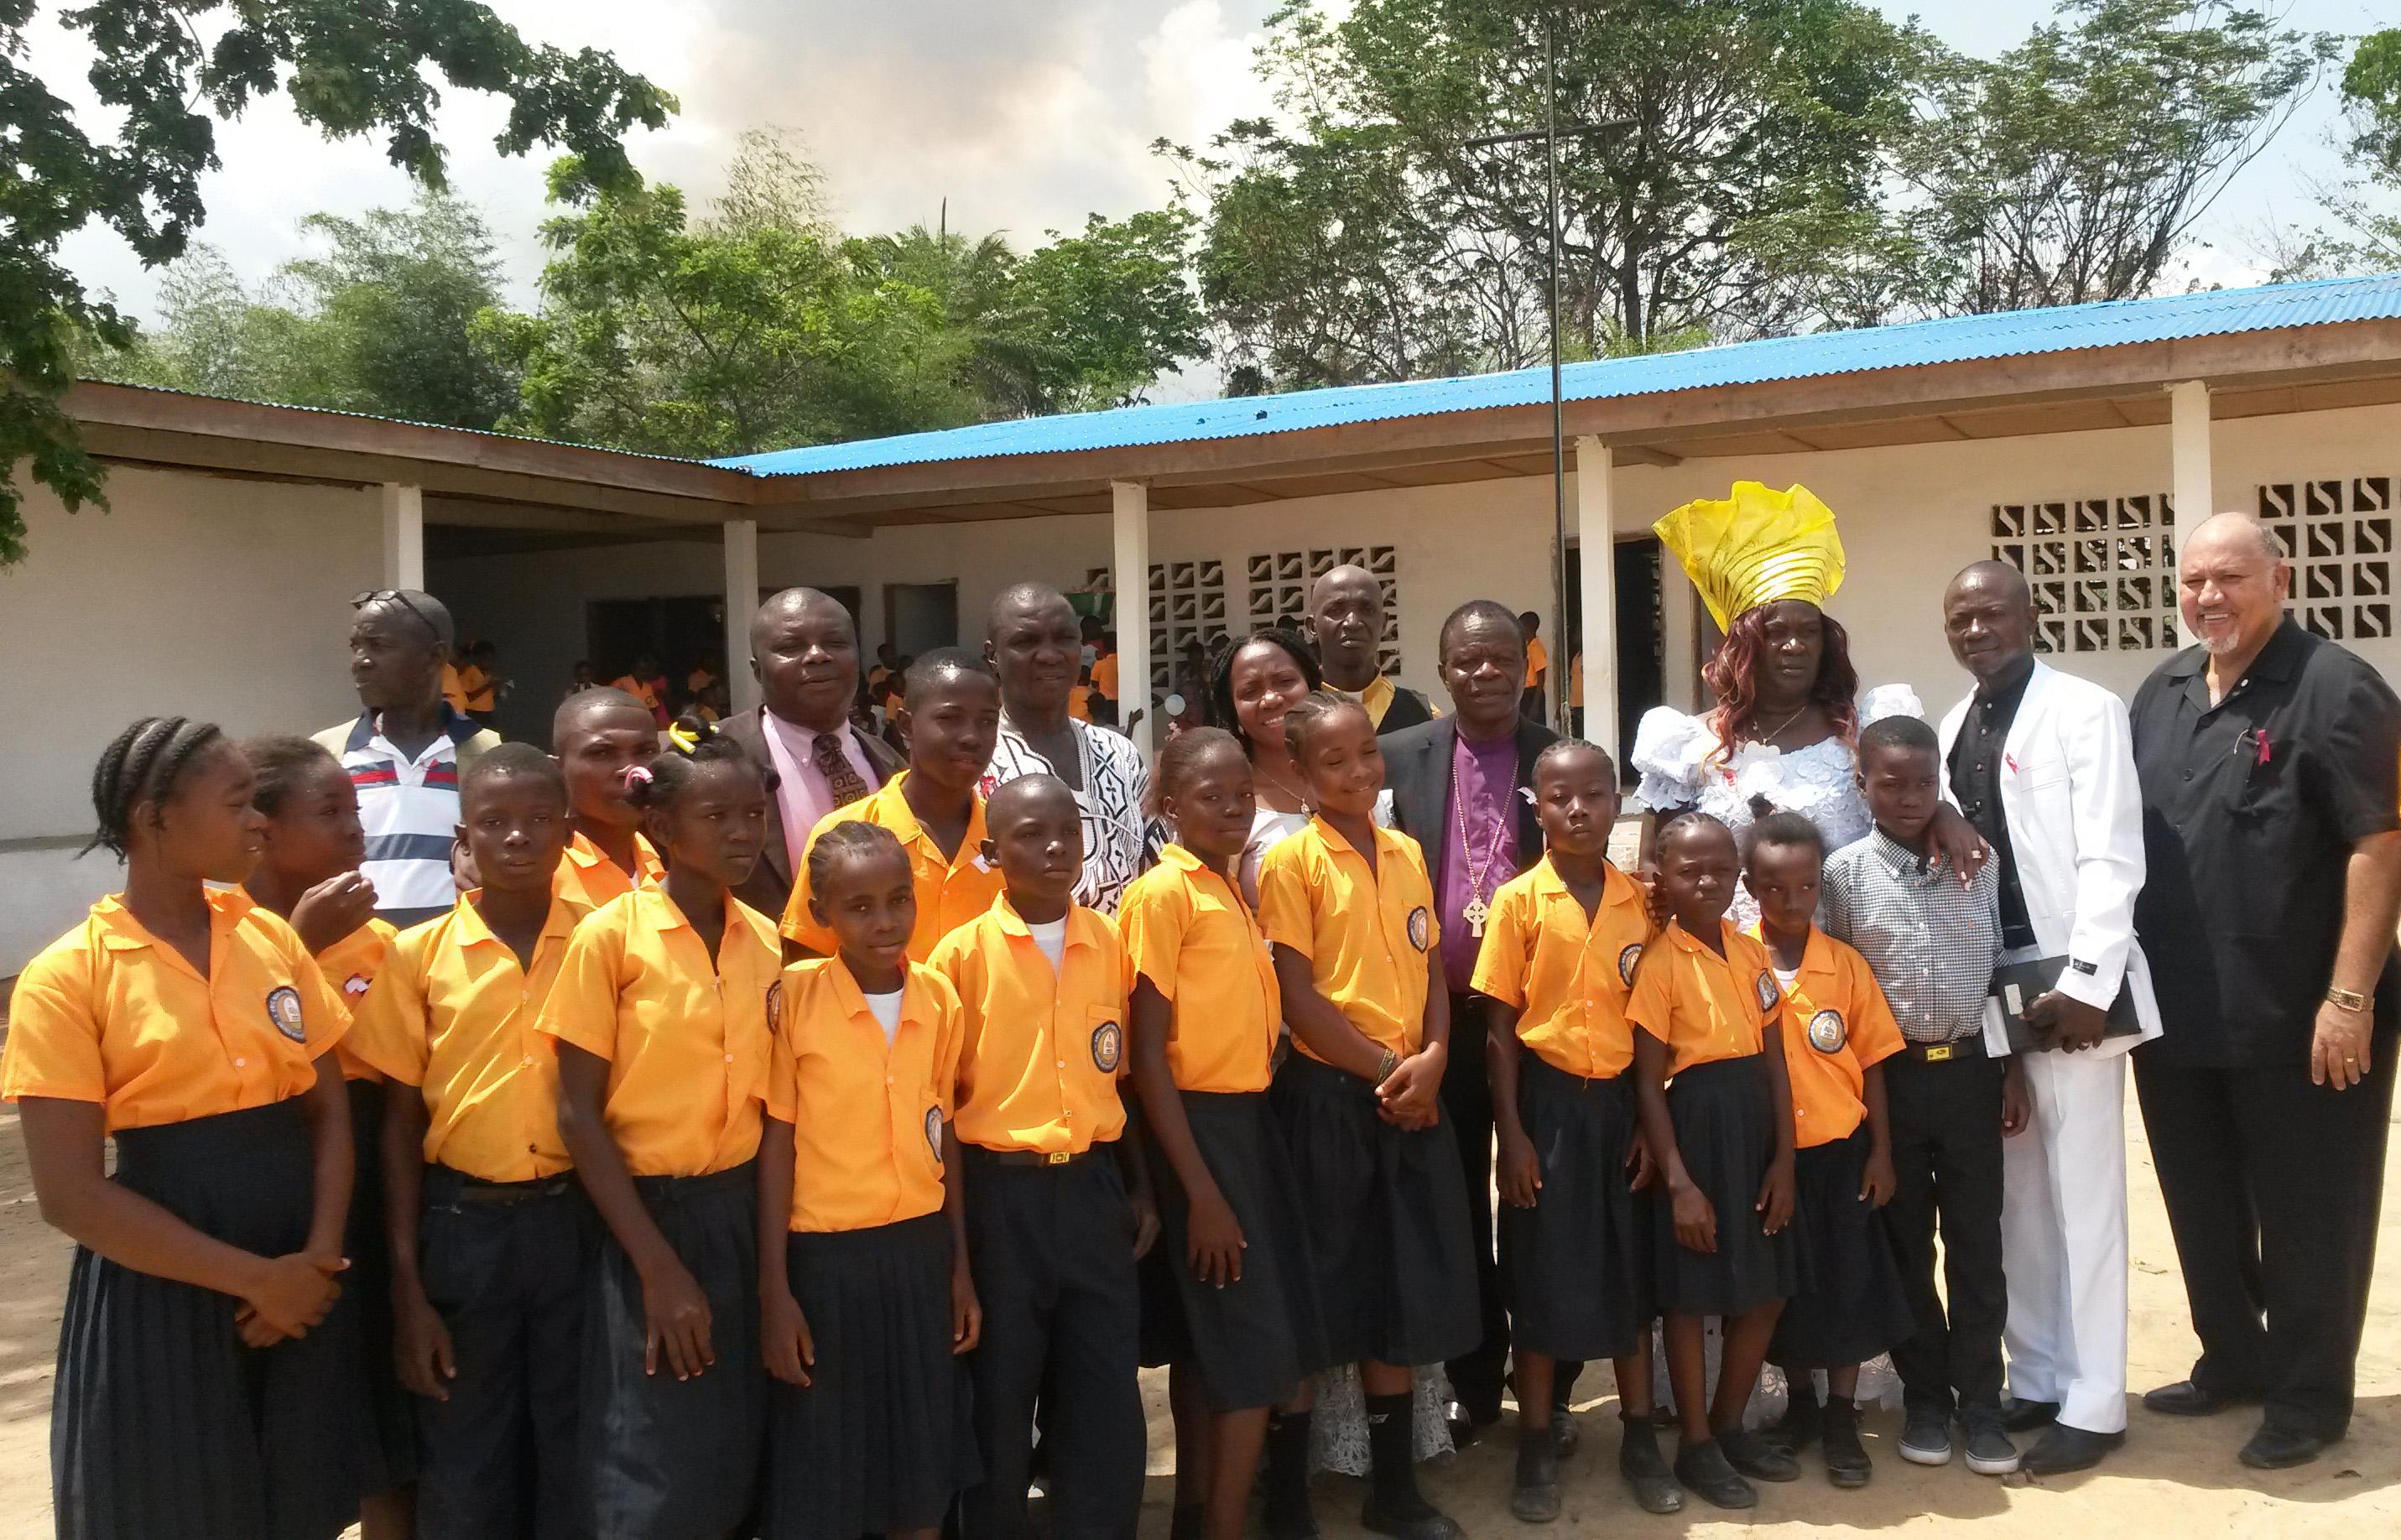 Members of leadership of The United Methodist Church in Liberia stand with students of the Eric Scott Memorial United Methodist School in Bopolu City, Gbarpolu, Liberia.